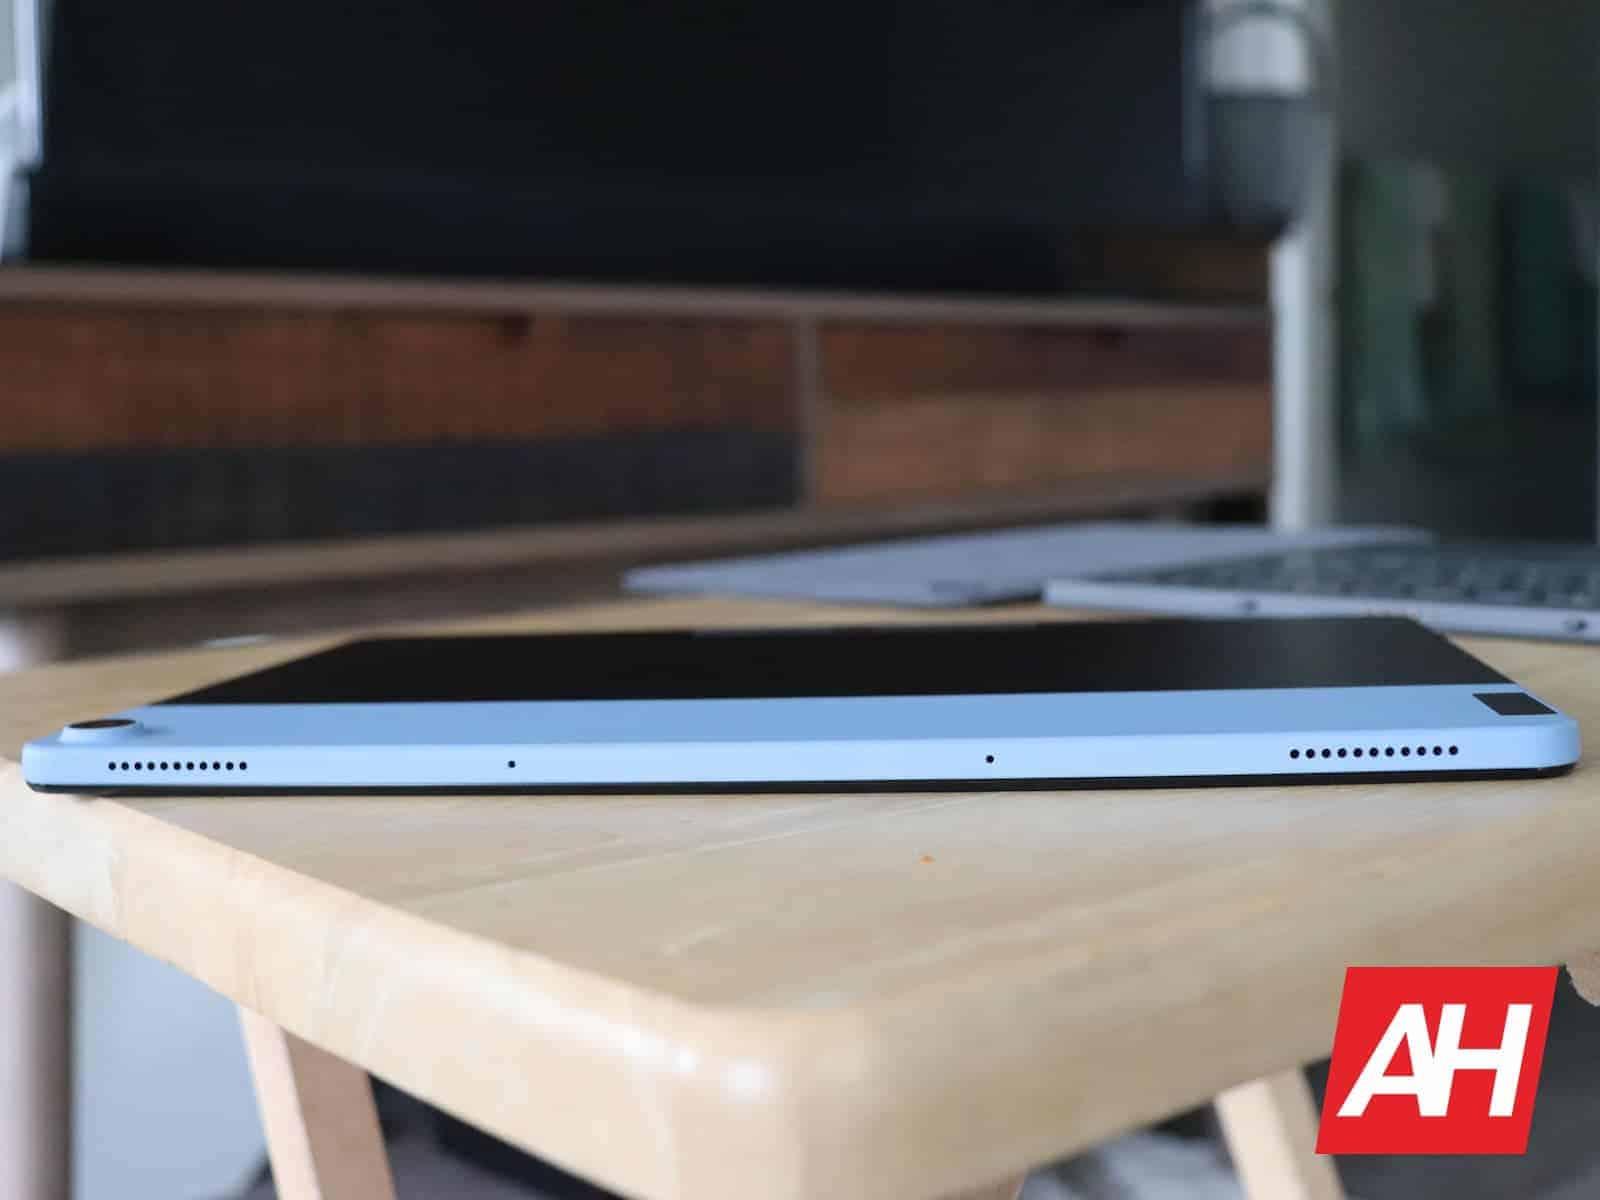 02 3 Lenovo IdeaPad Duet Hardware AH 2020